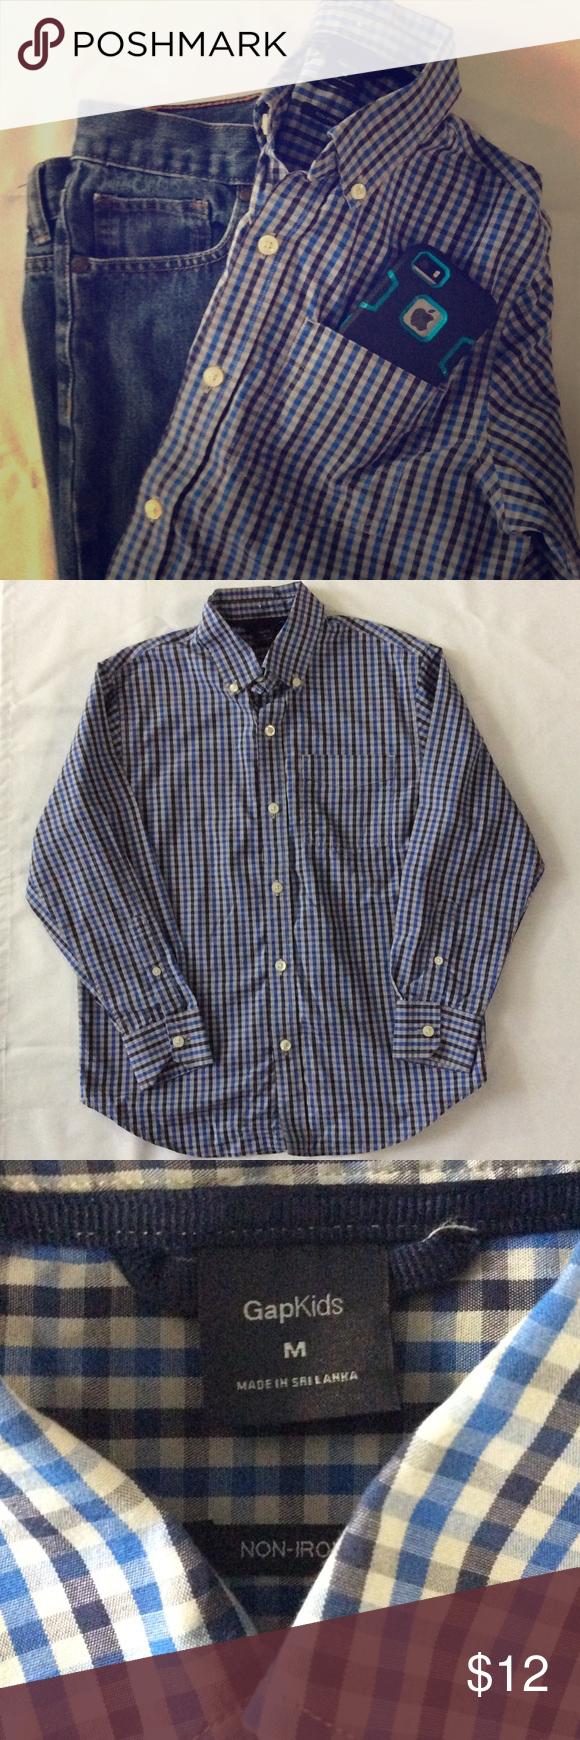 Kids gap button up long sleeved gingham classic navygrayblack